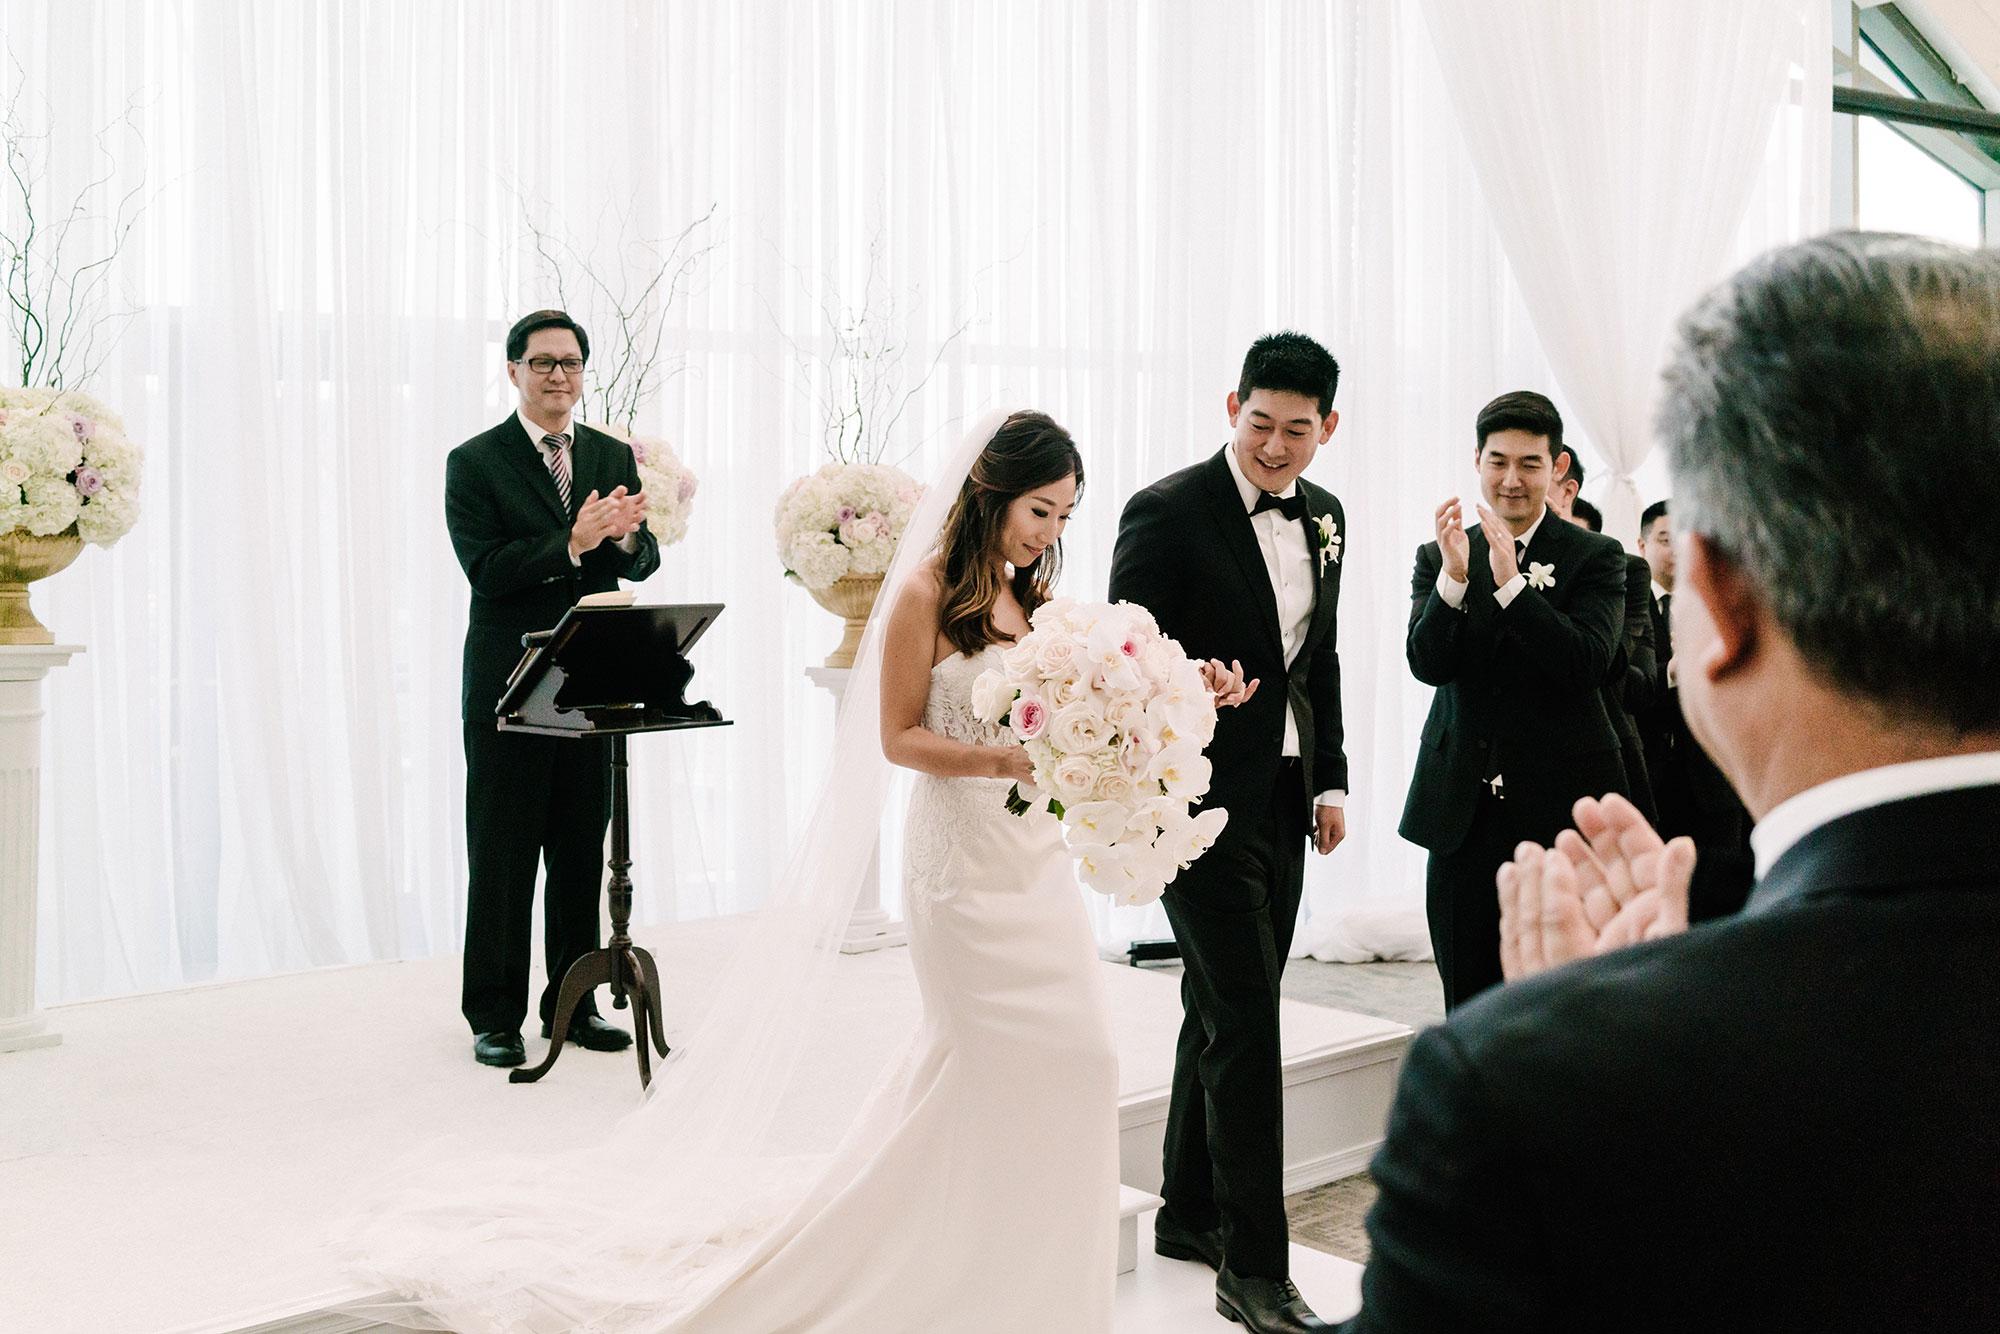 Congratulations to the happy couple, Joyce and Joe <3